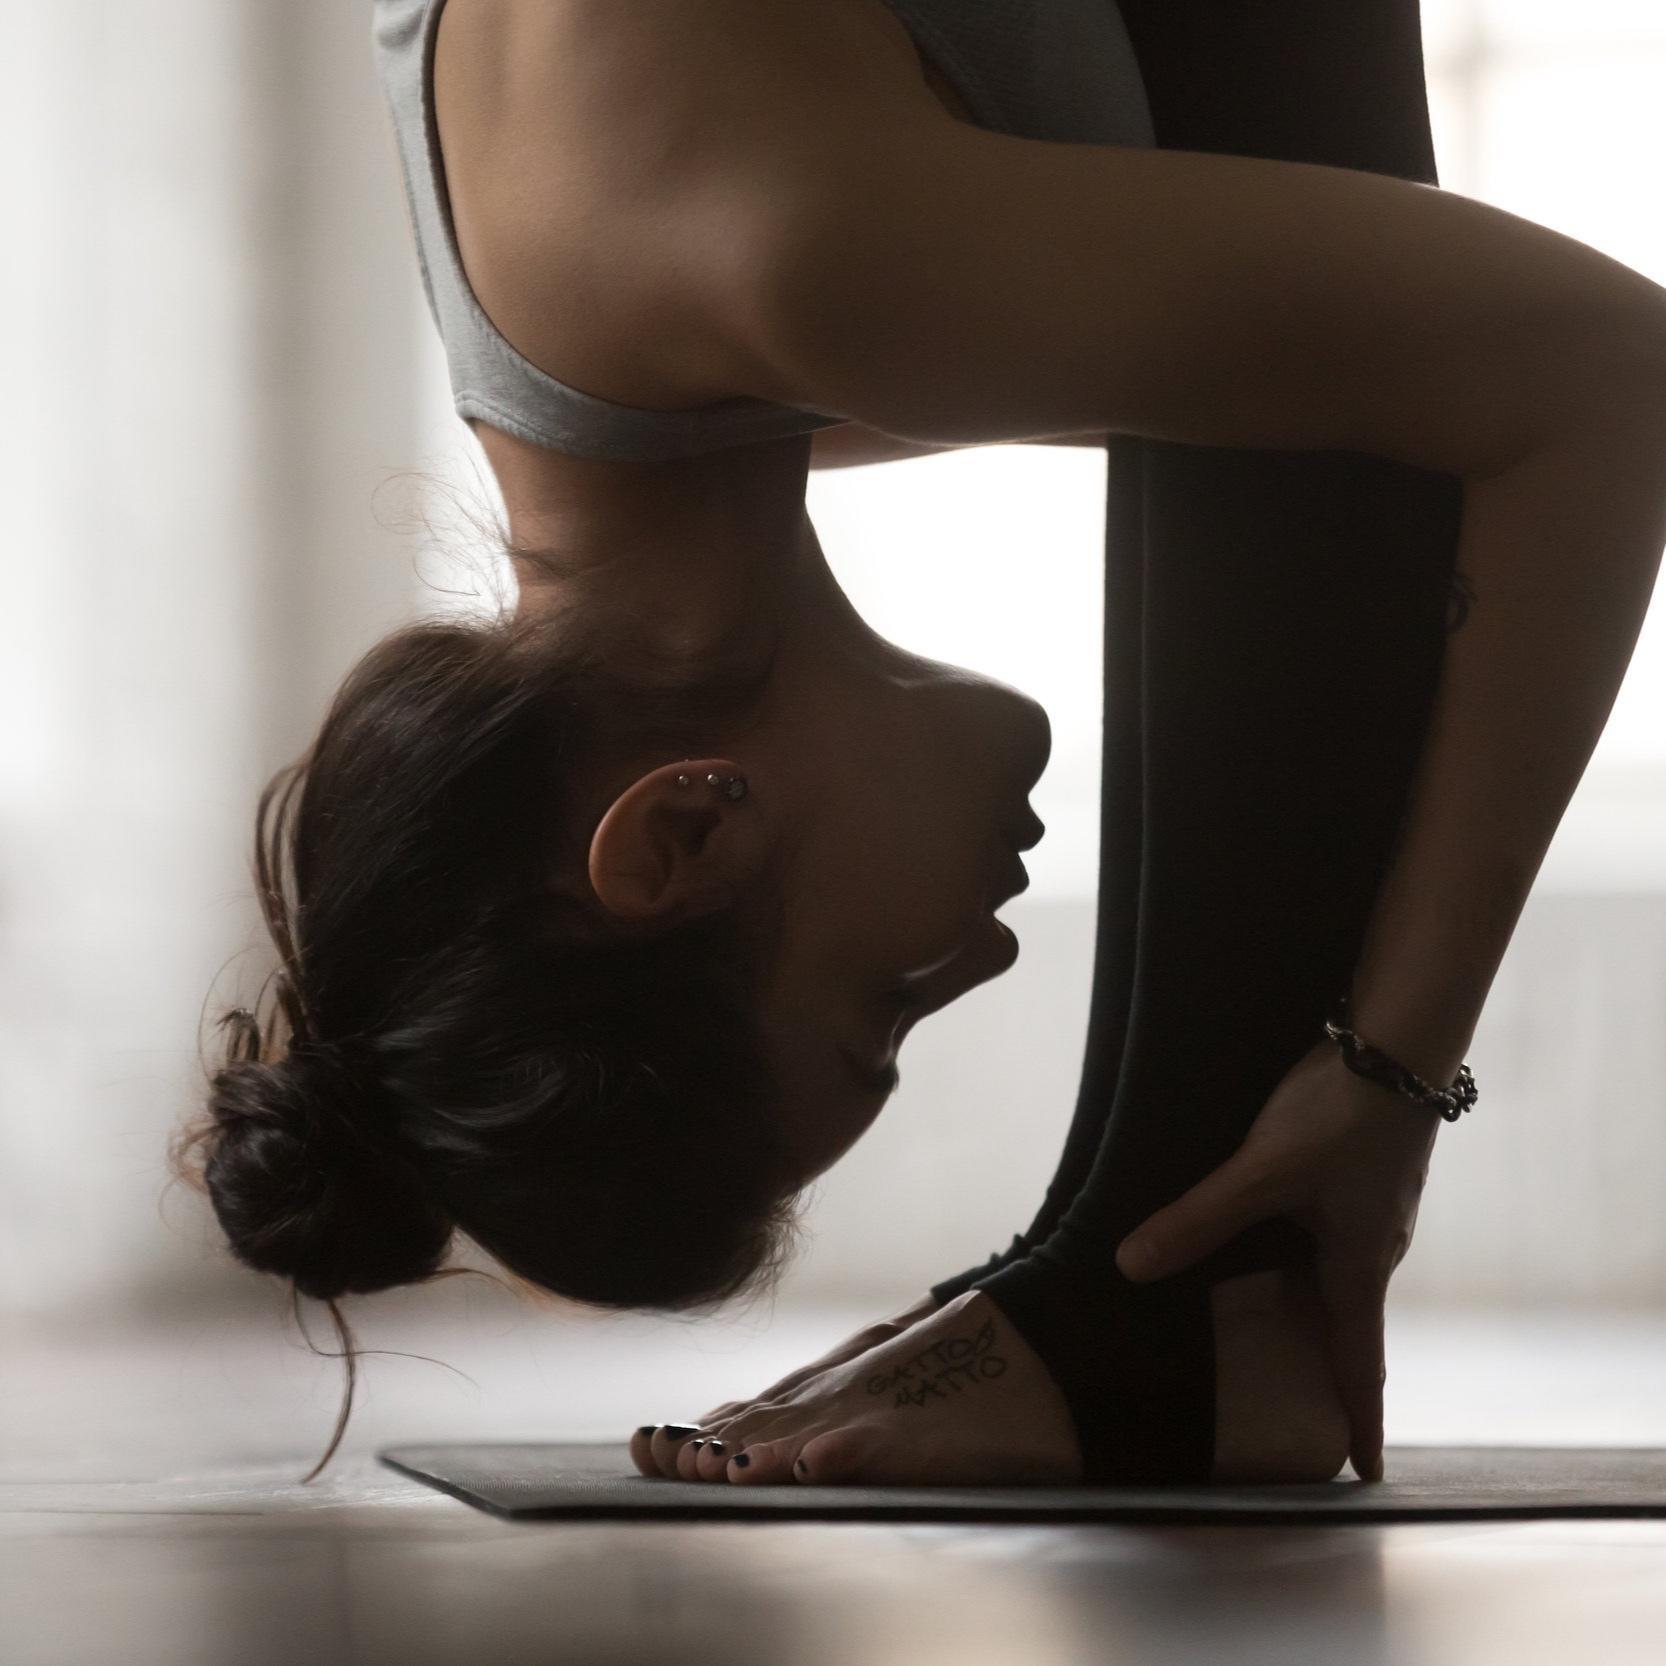 Yoga+1-1+Small.jpg